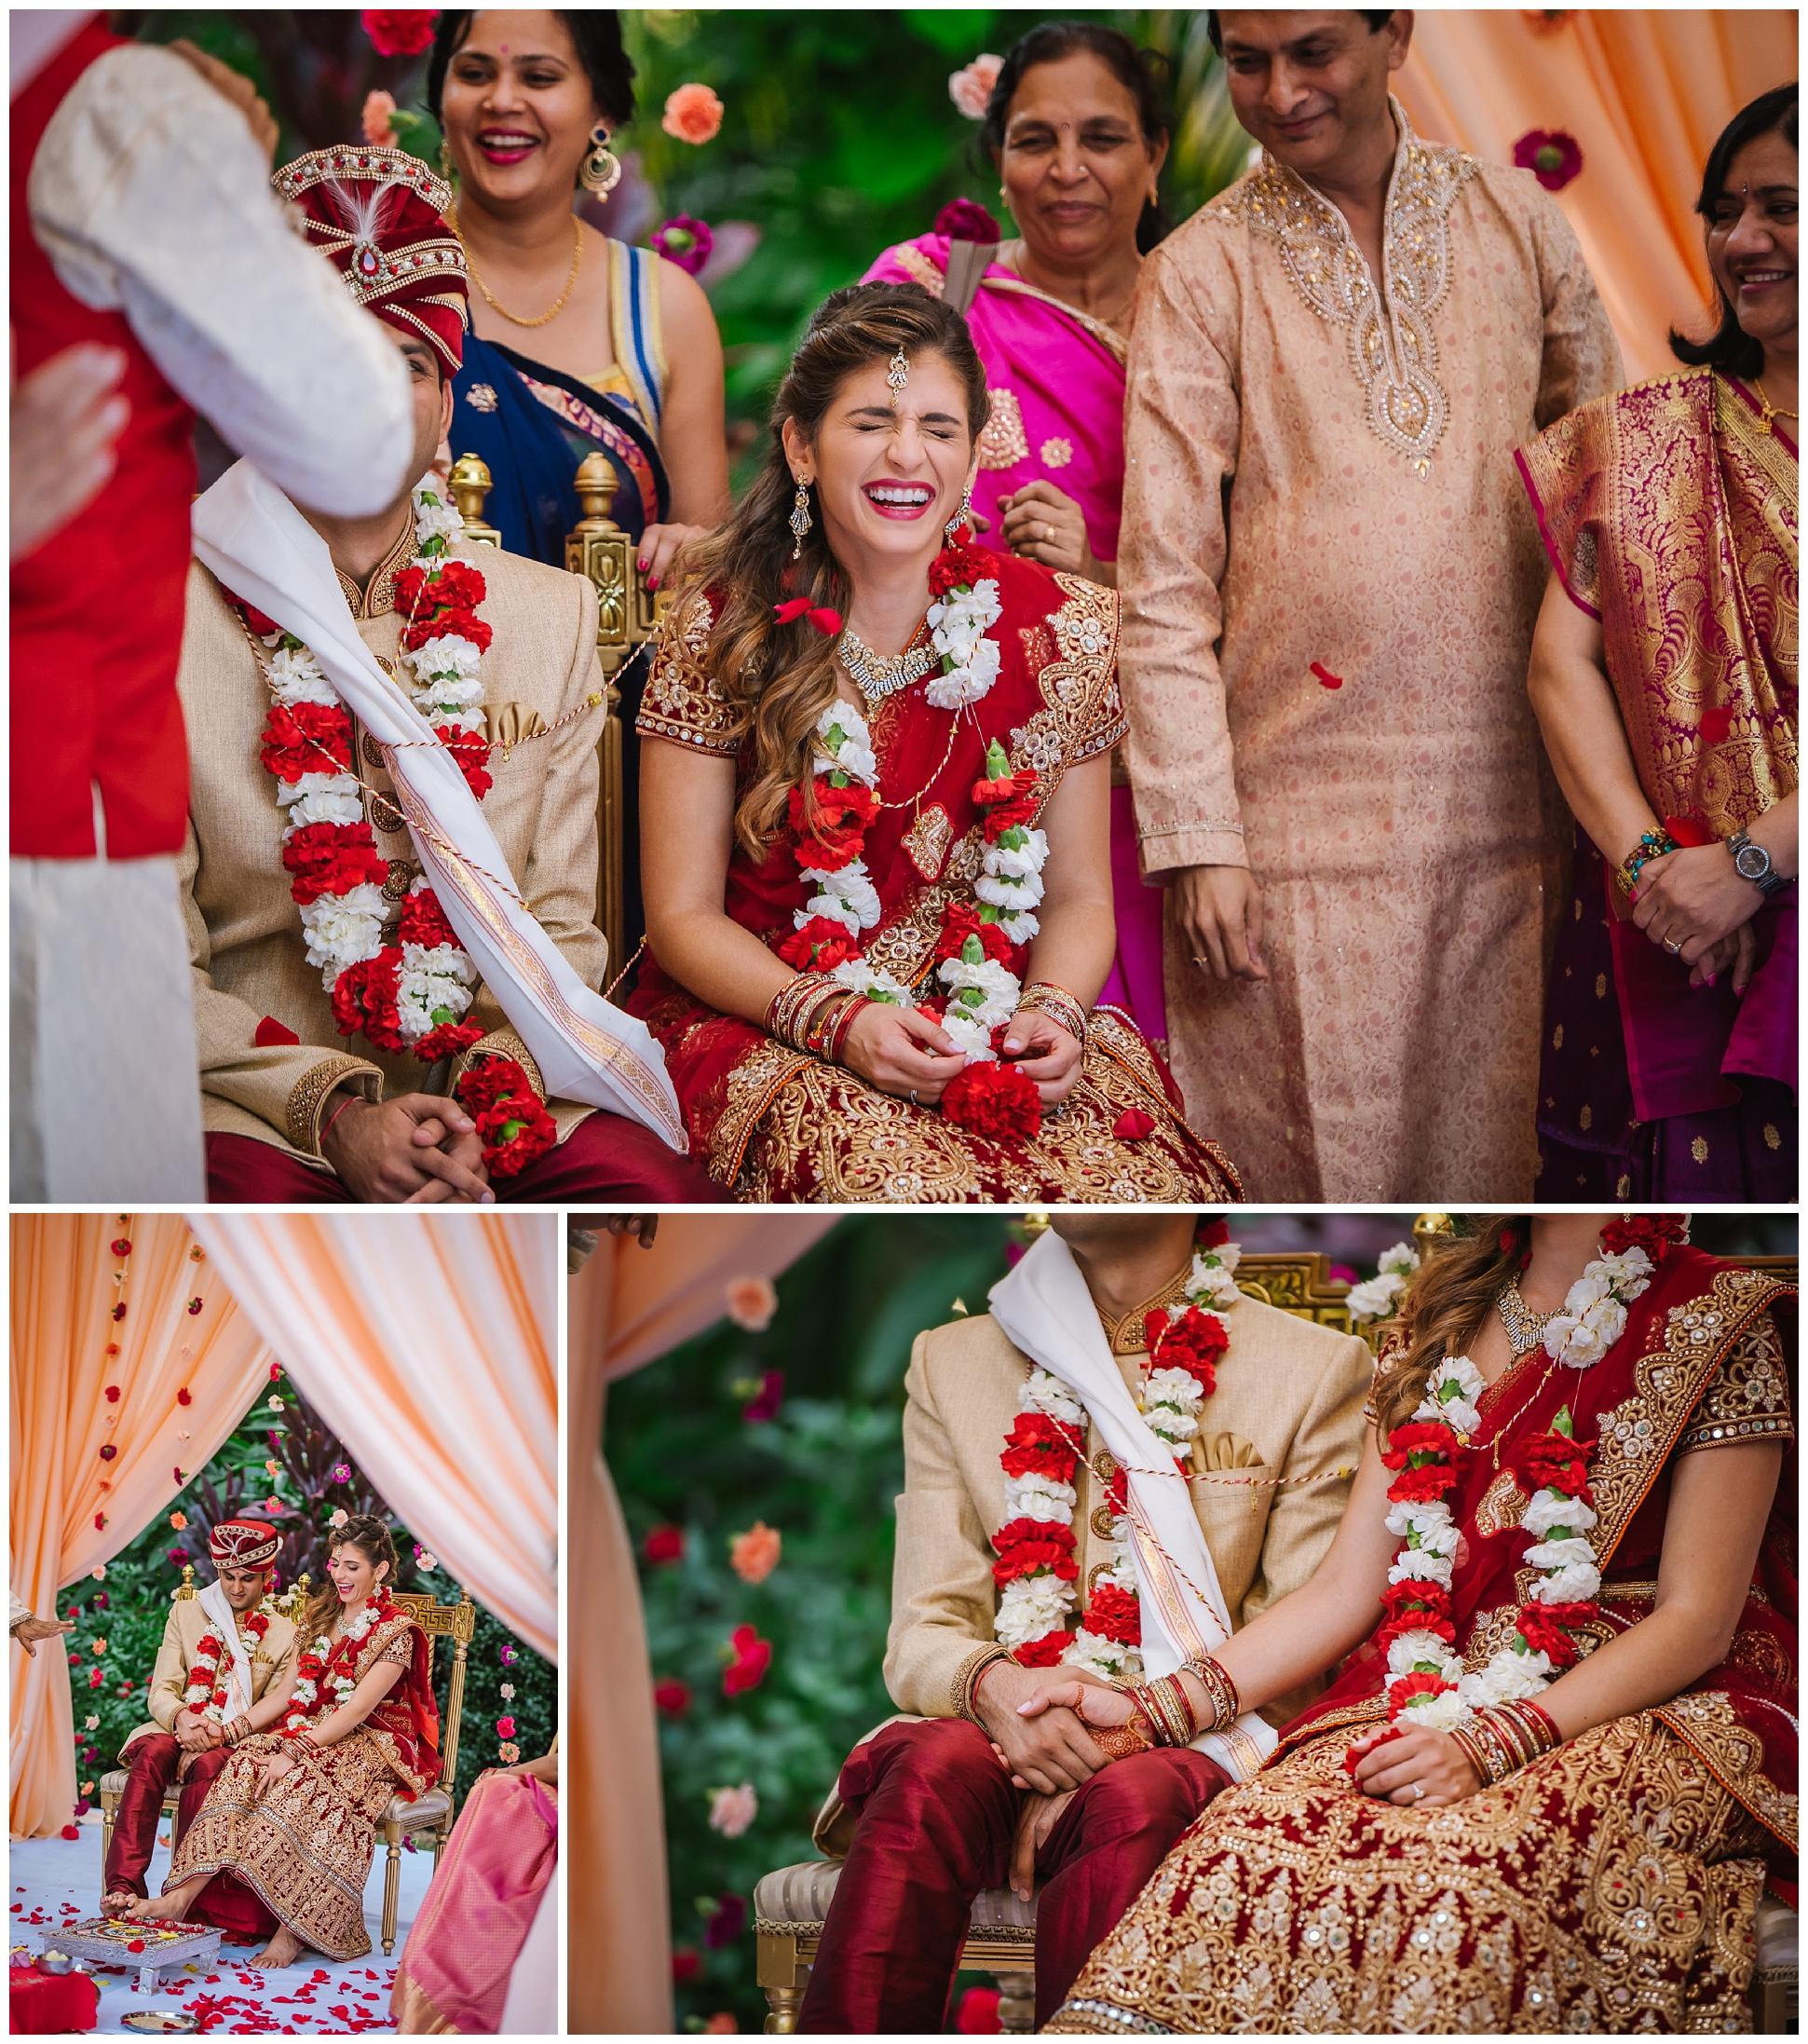 St-pete-indian-wedding-photographer-barat-sunken-gardens_0120.jpg